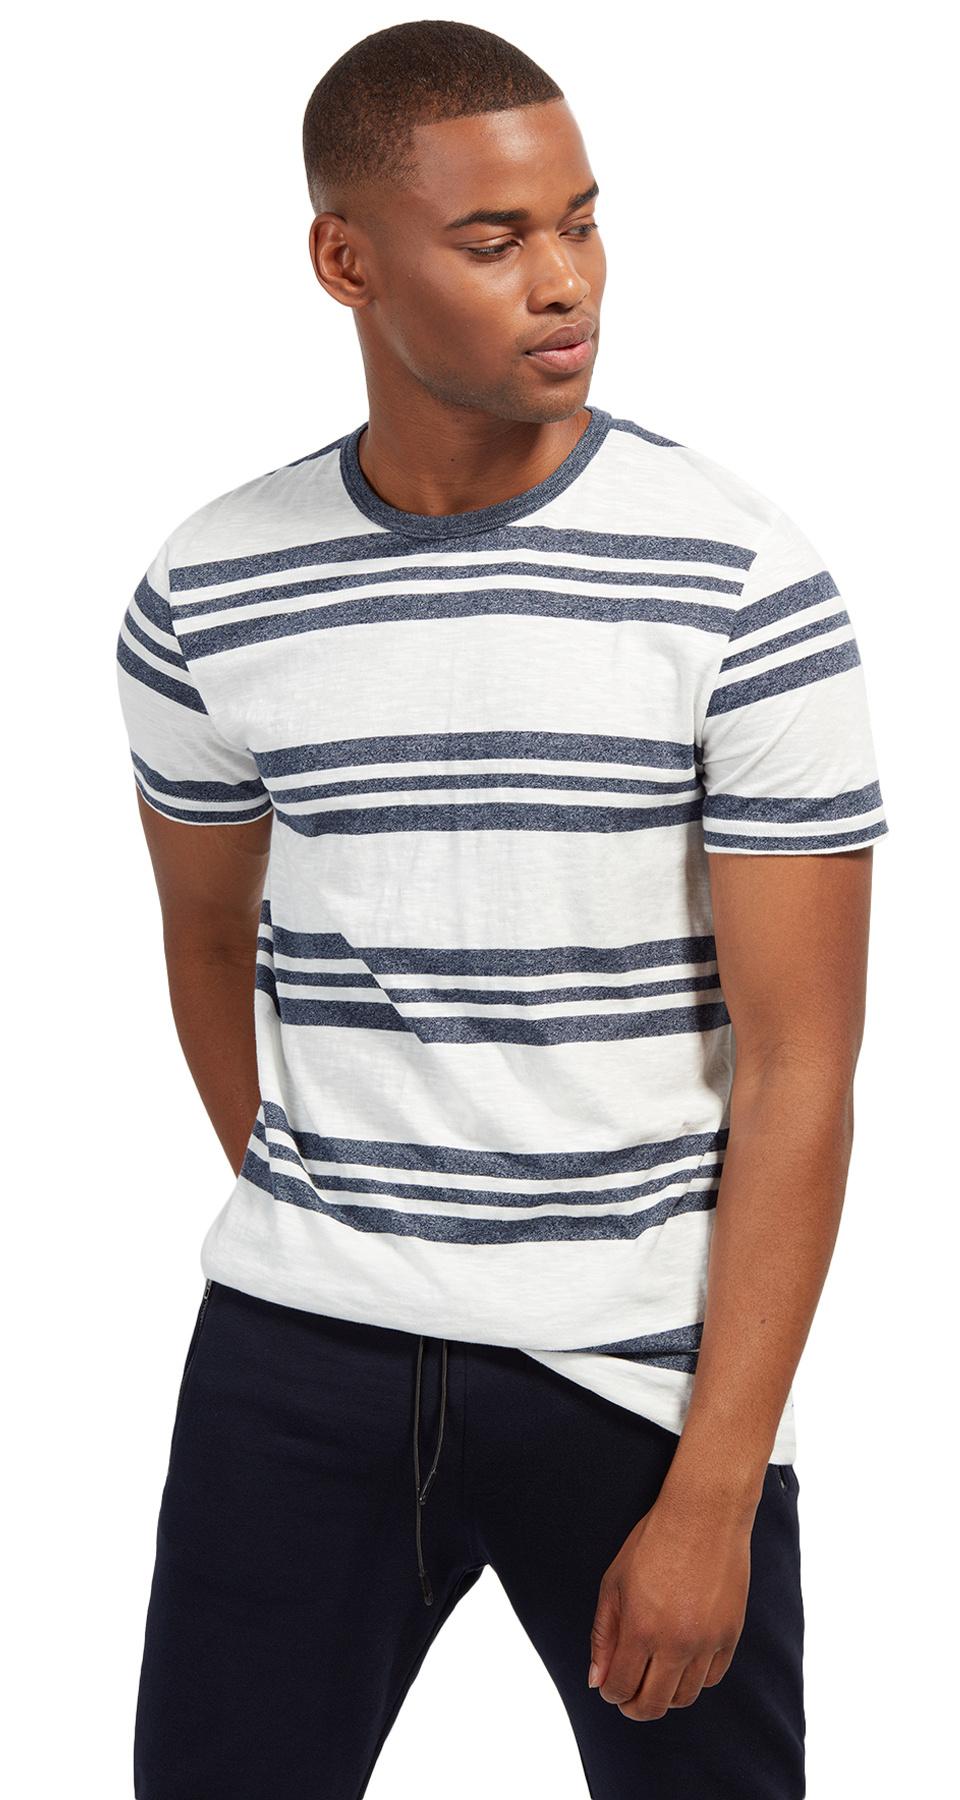 Tom Tailor triko s proužkem 10550940071/6740 Modrá XXL